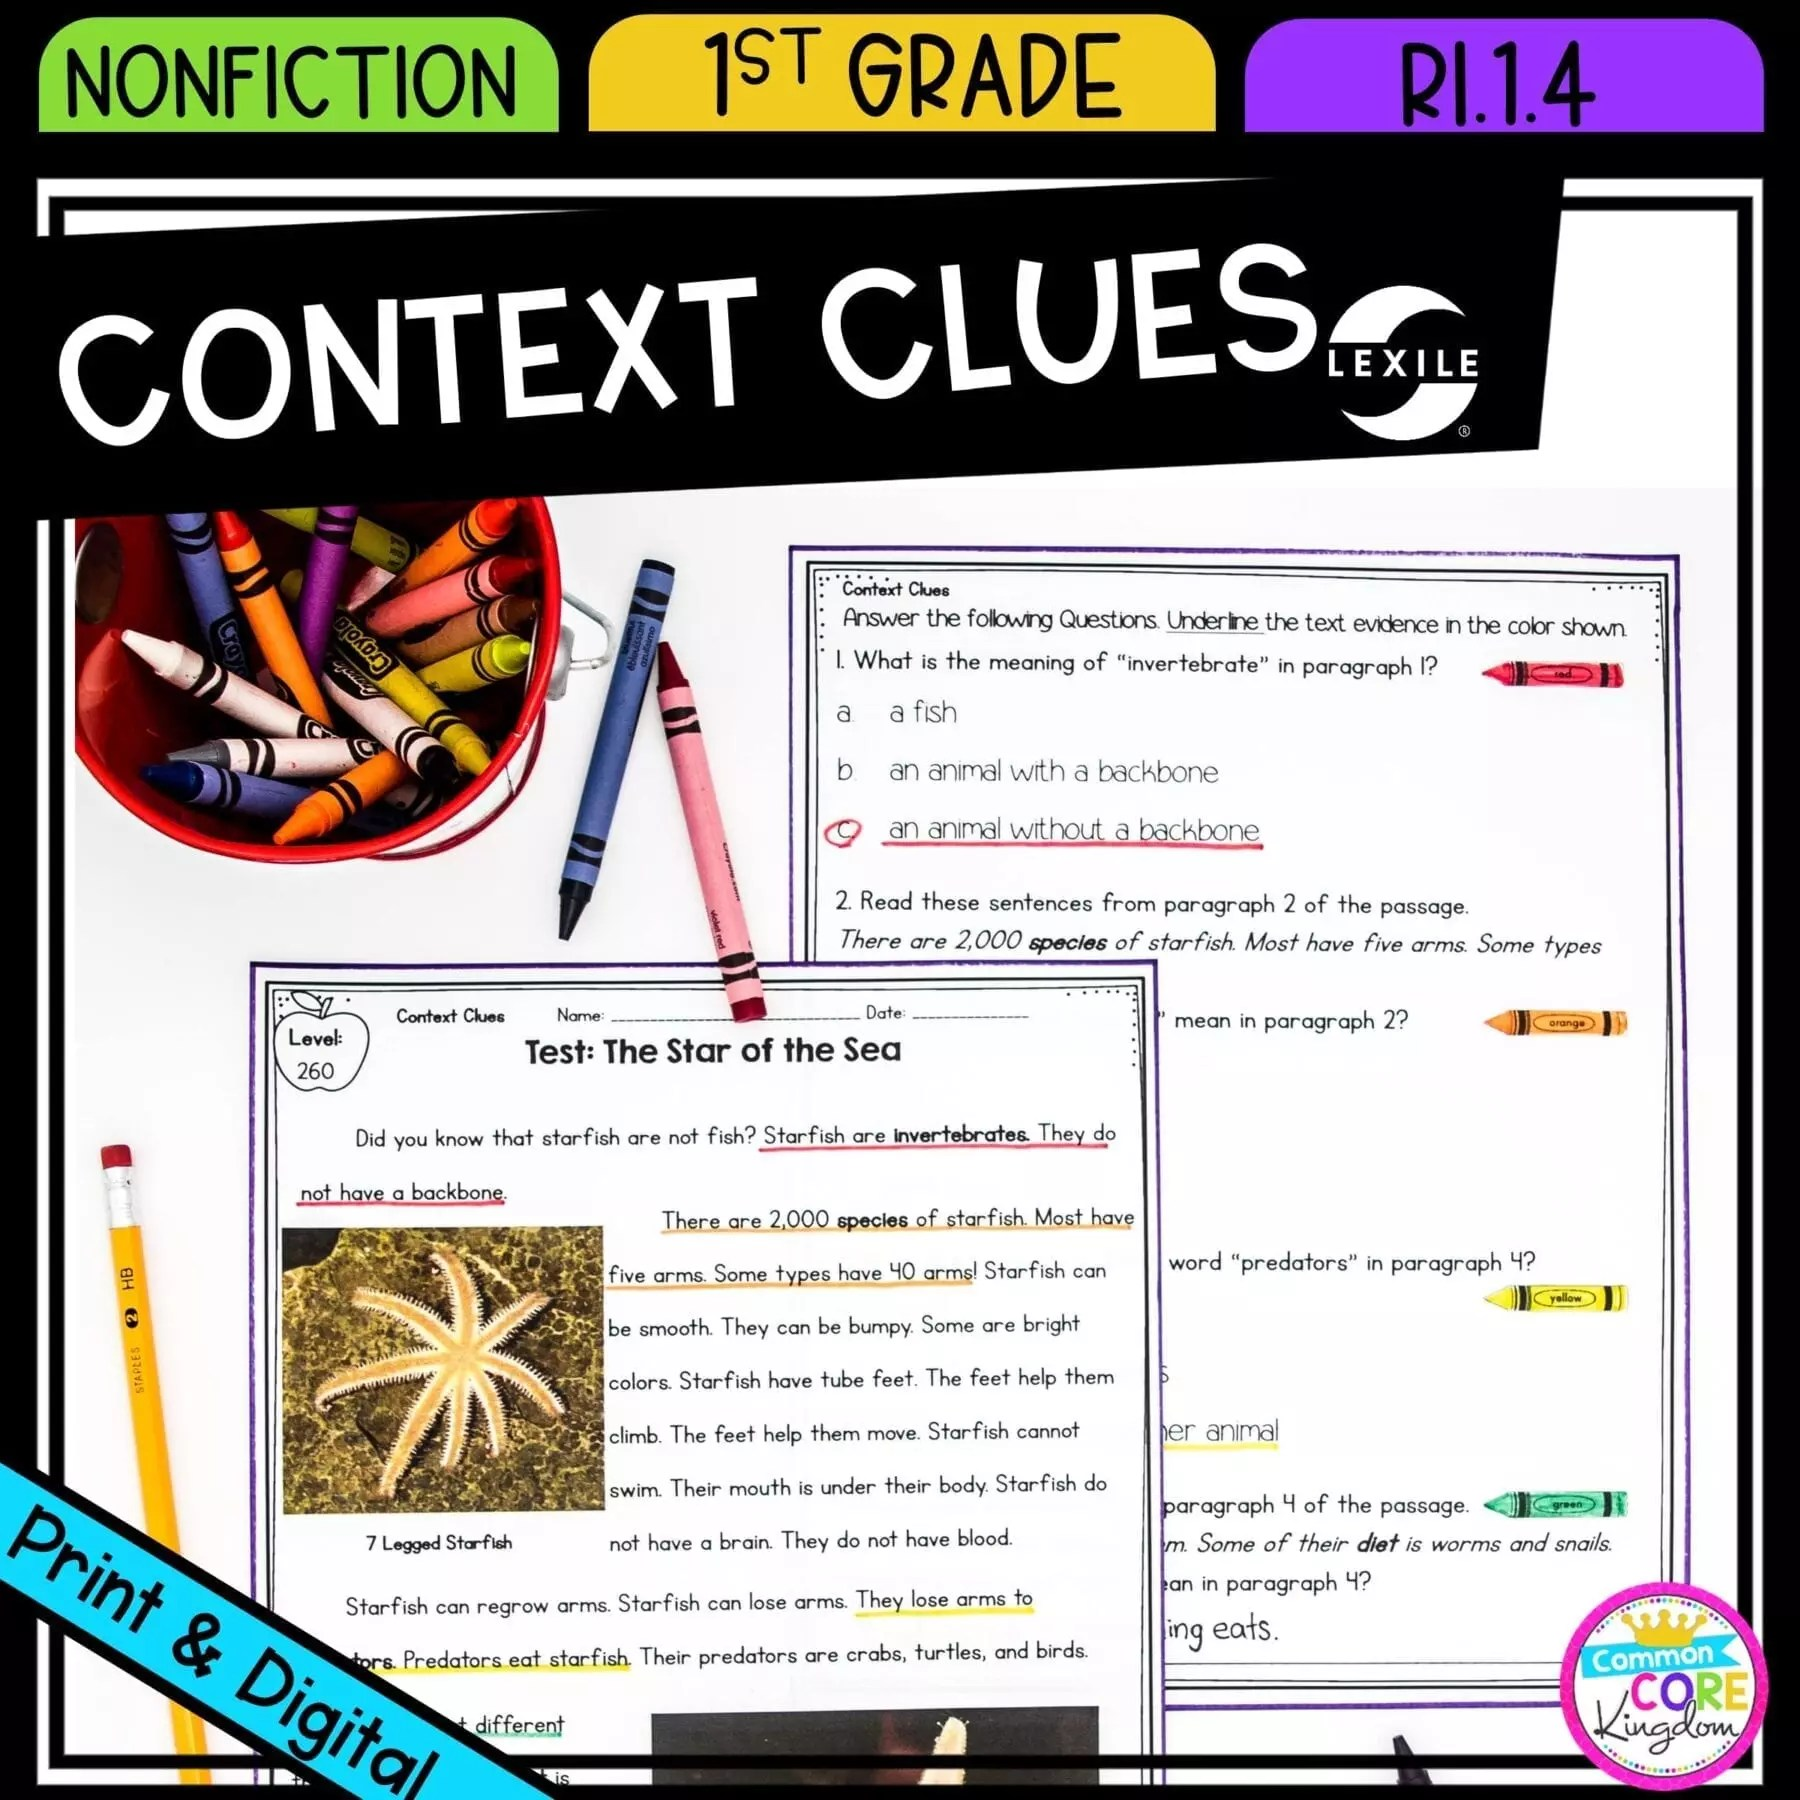 Context Clues in Nonfiction - 1st Grade - RI.1.4 Printable \u0026 Digital Google  Slides Distance Learning   Common Core Kingdom [ 1800 x 1800 Pixel ]